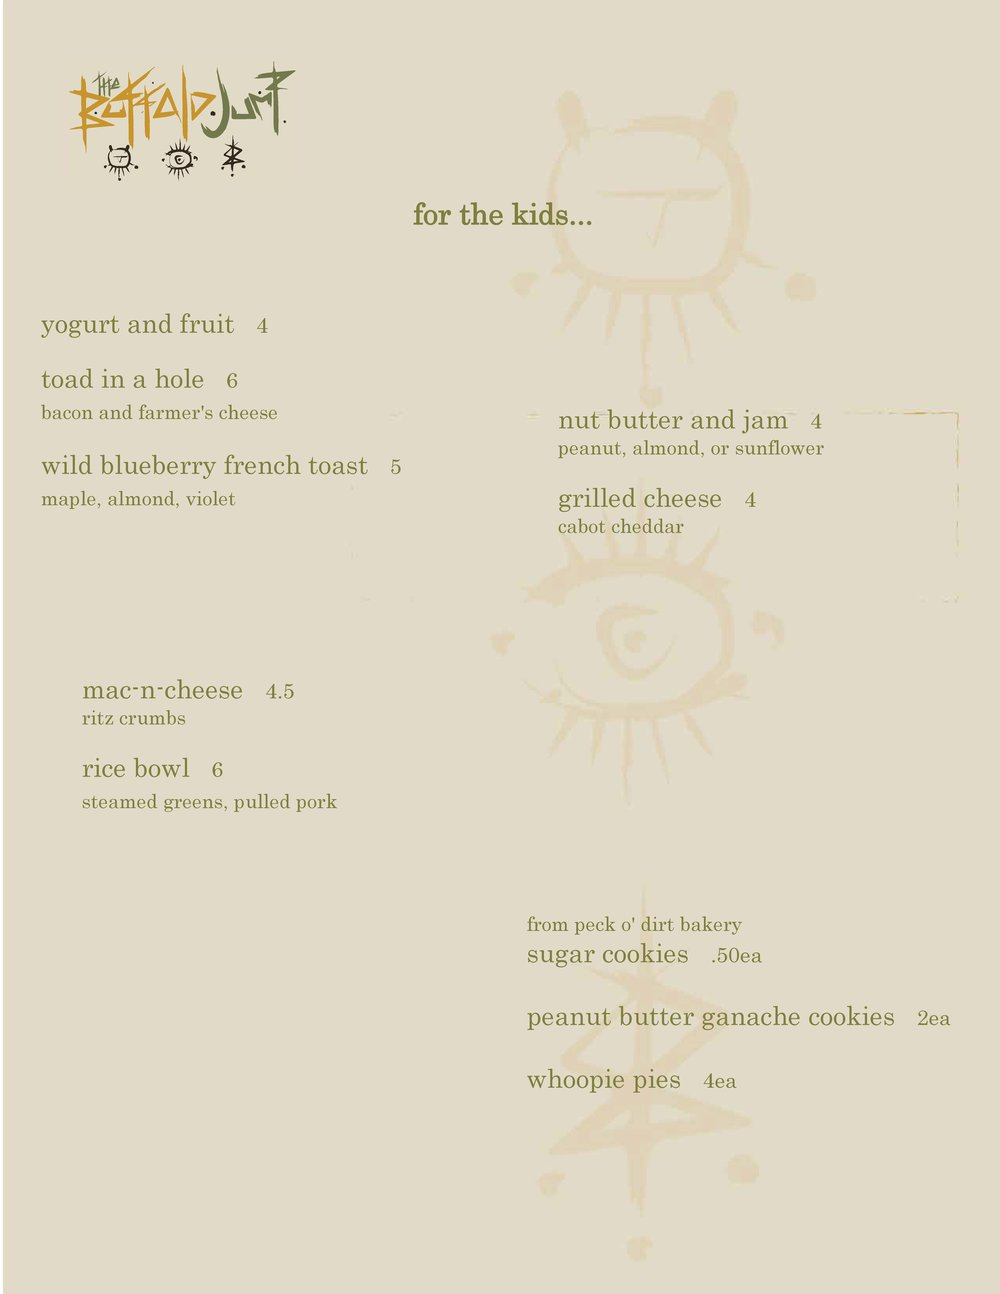 tbj kids menu.jpg